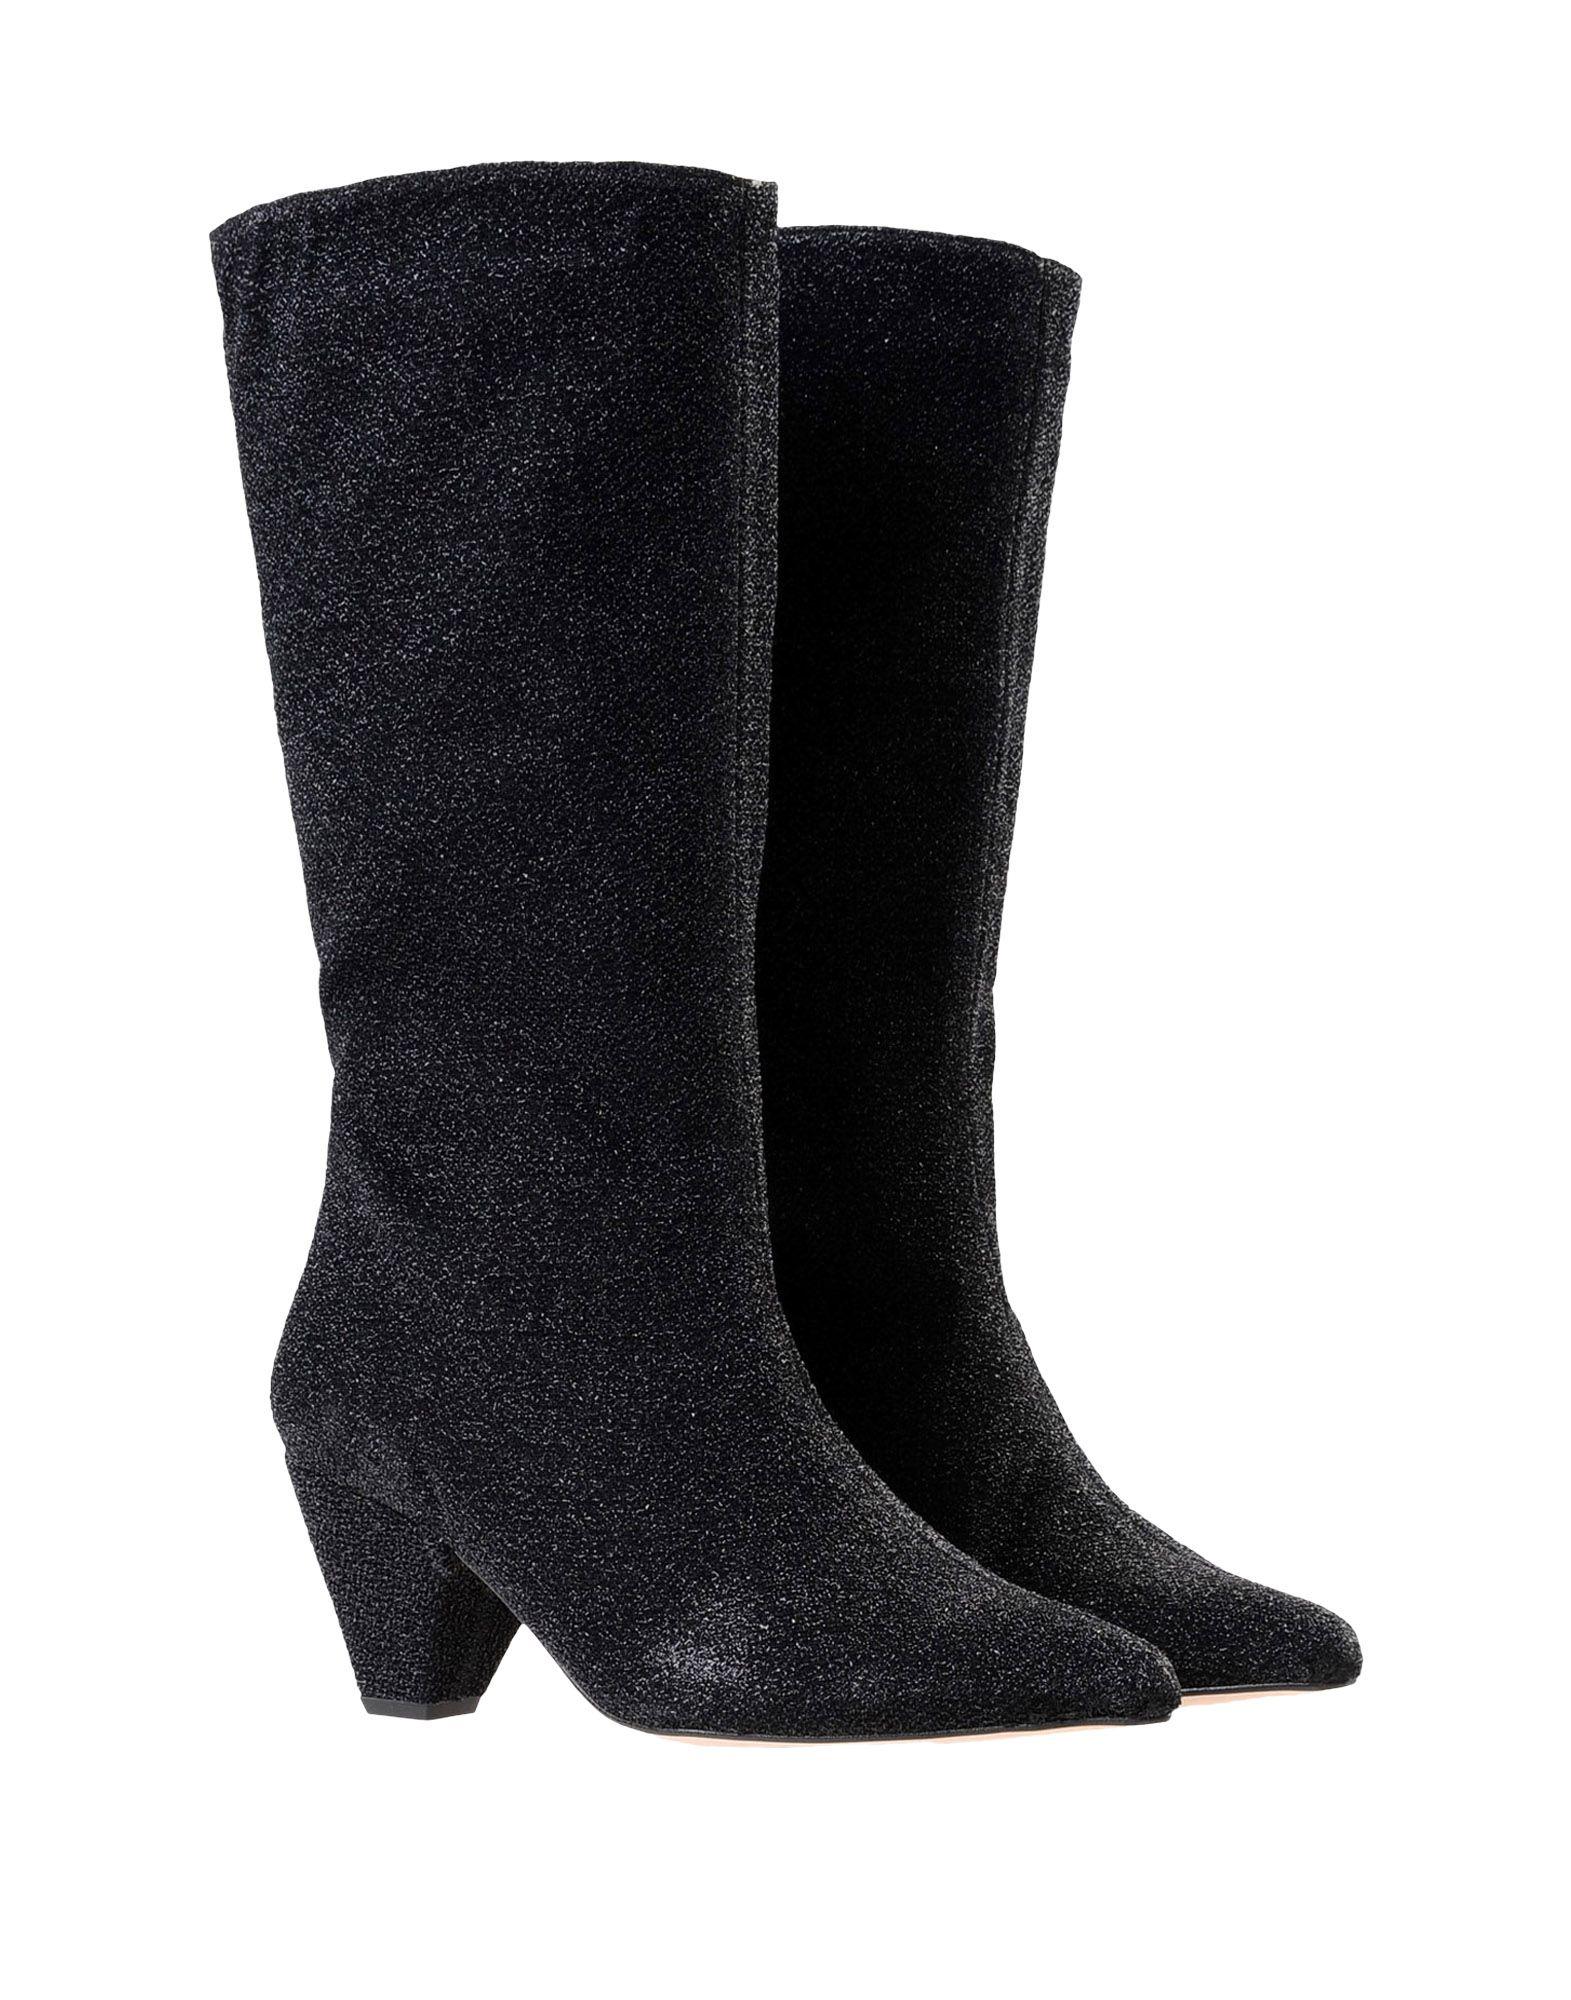 Stilvolle billige Schuhe George J. Love Stiefel  Damen  Stiefel 11541788OL 3b2af4